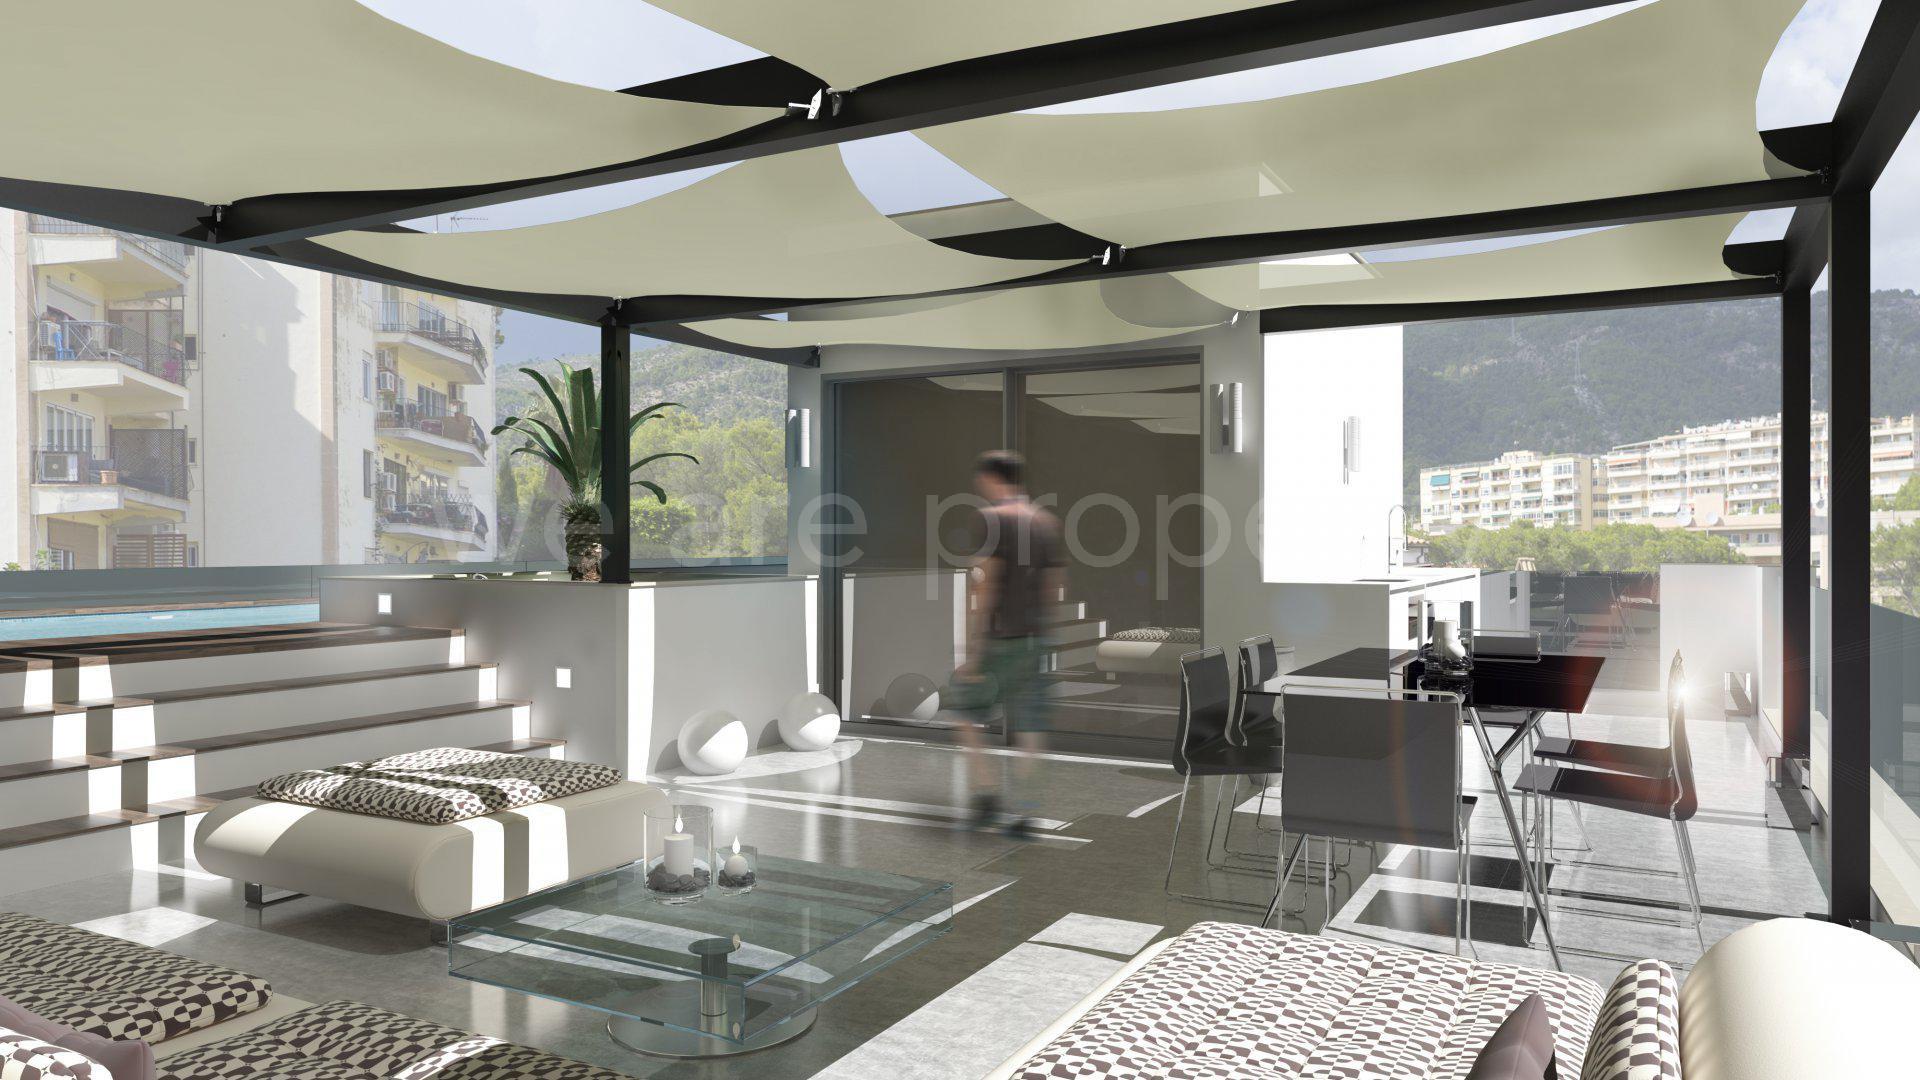 Exclusivo ático con piscina privada